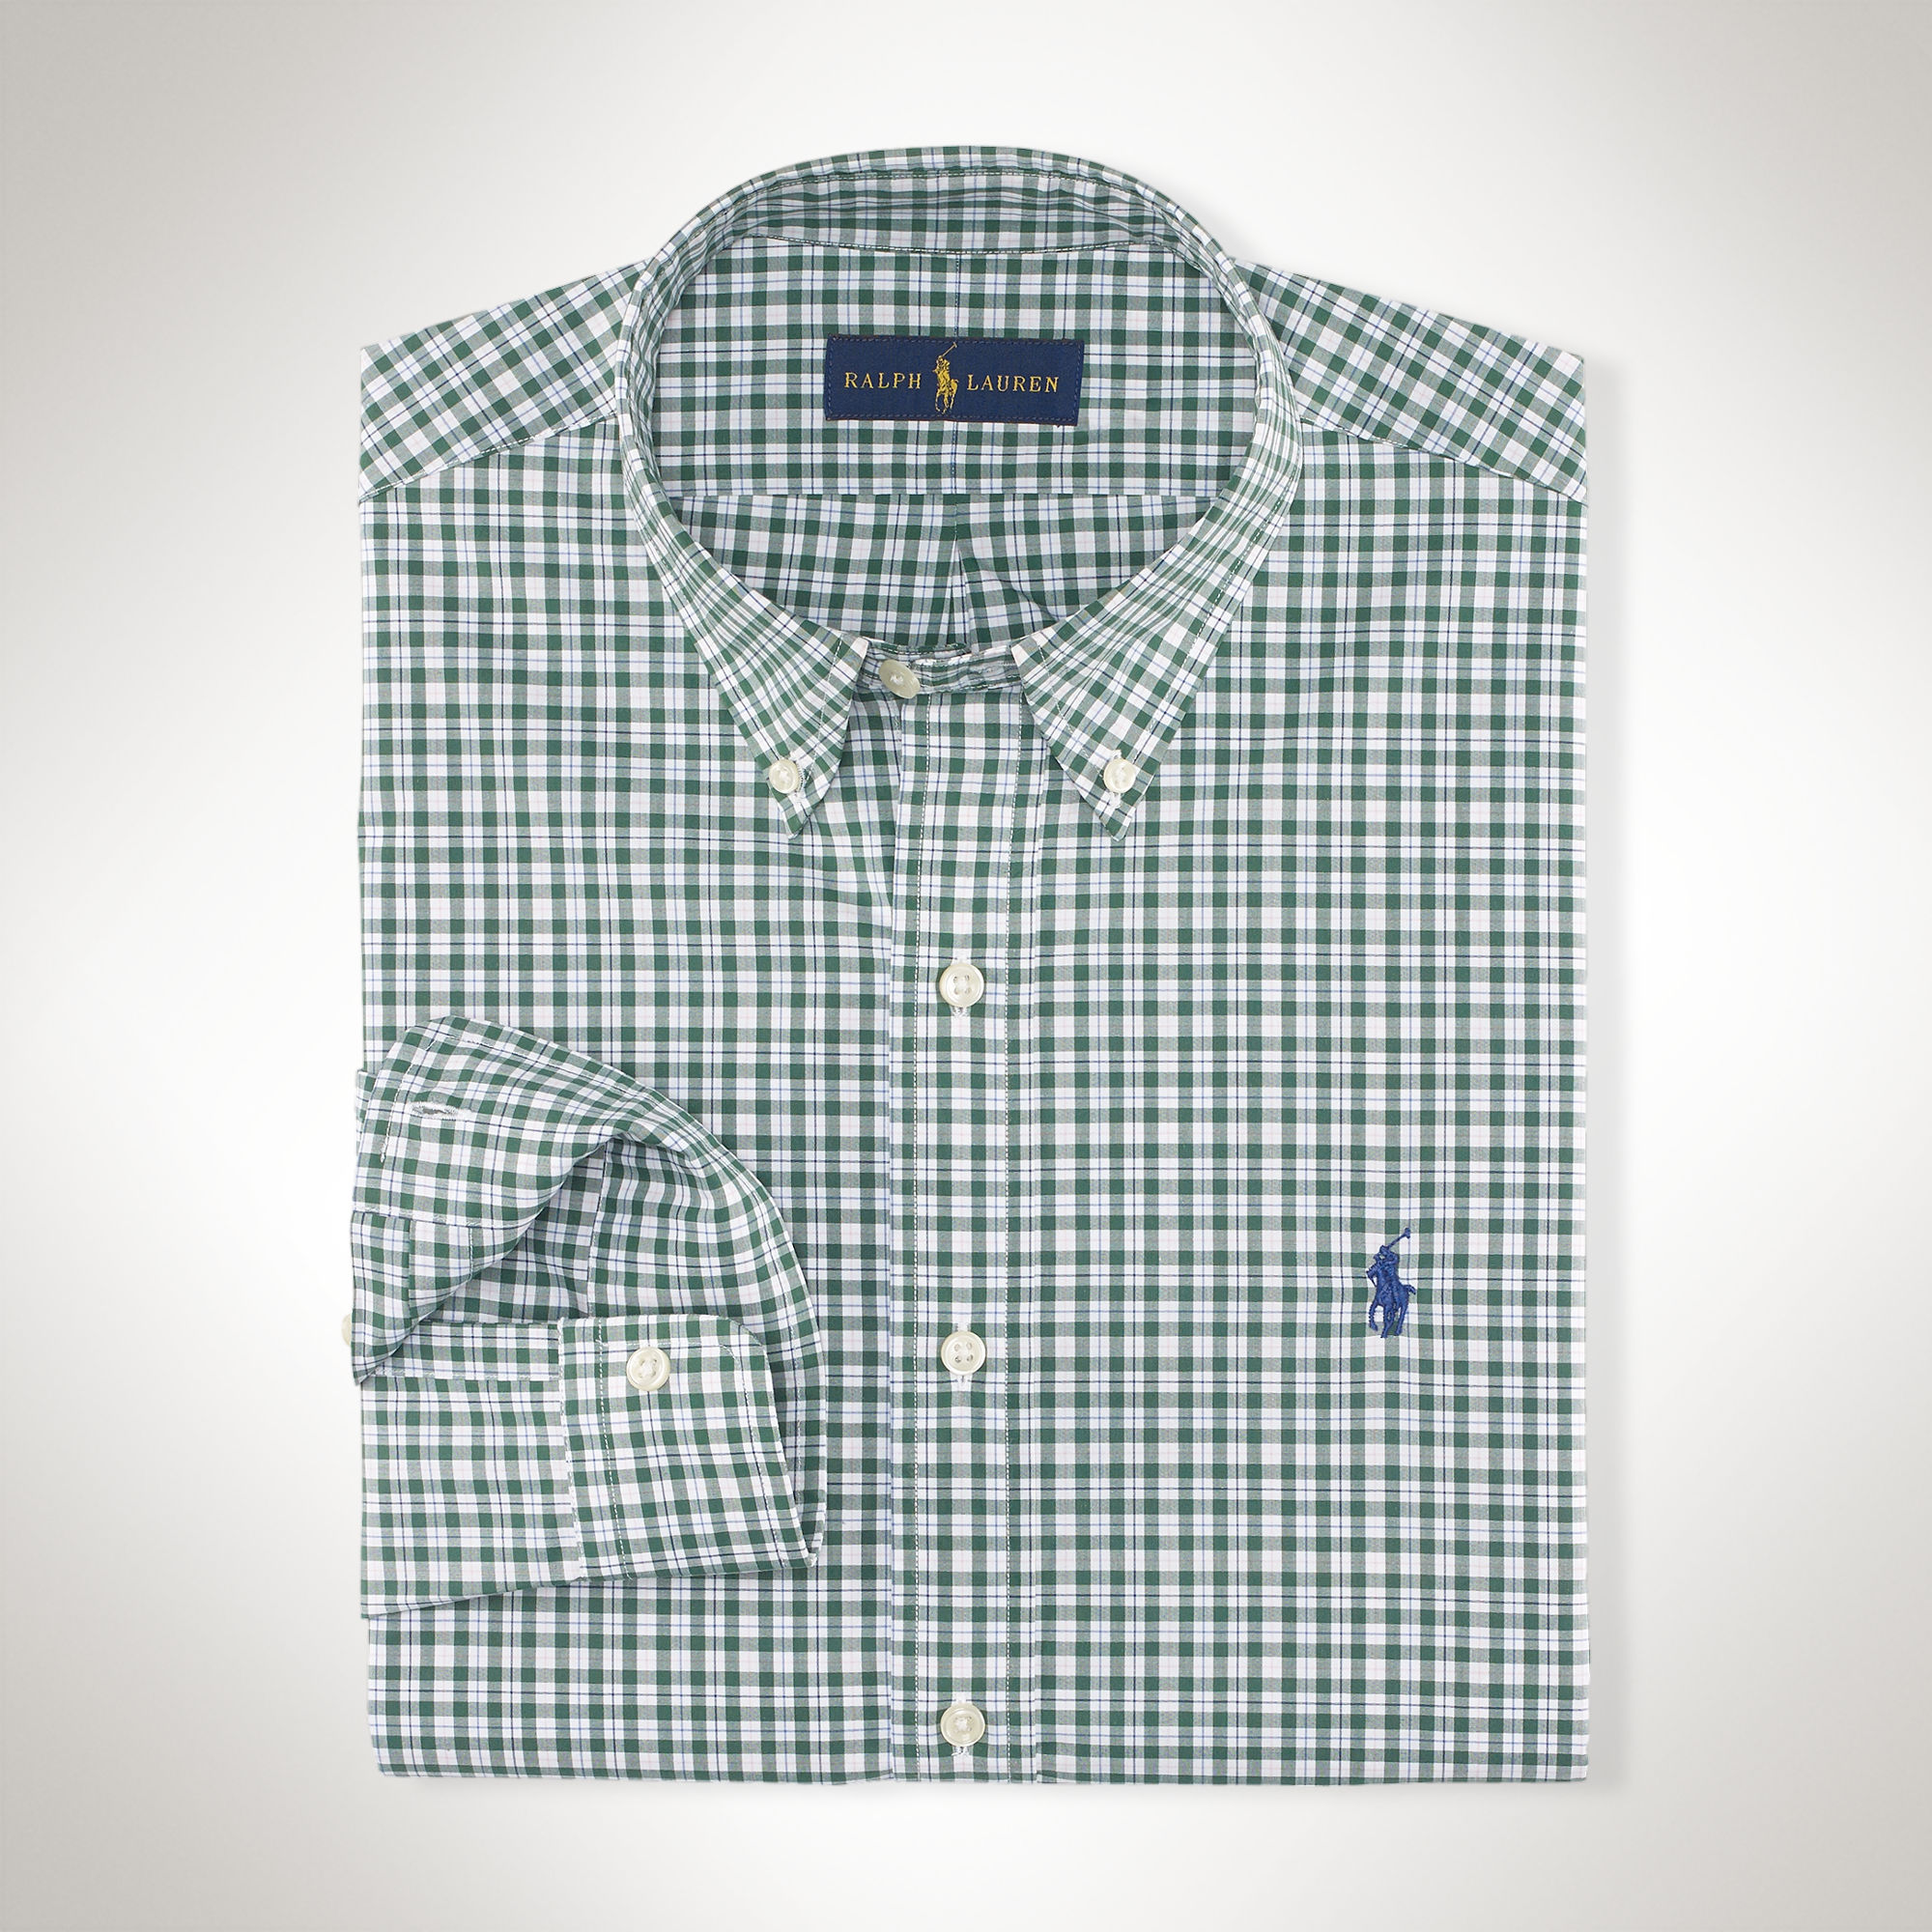 Ralph Lauren Gömlek Ivy-White - 4 #   Maslak Outlet #RalphLauren #Gömlek